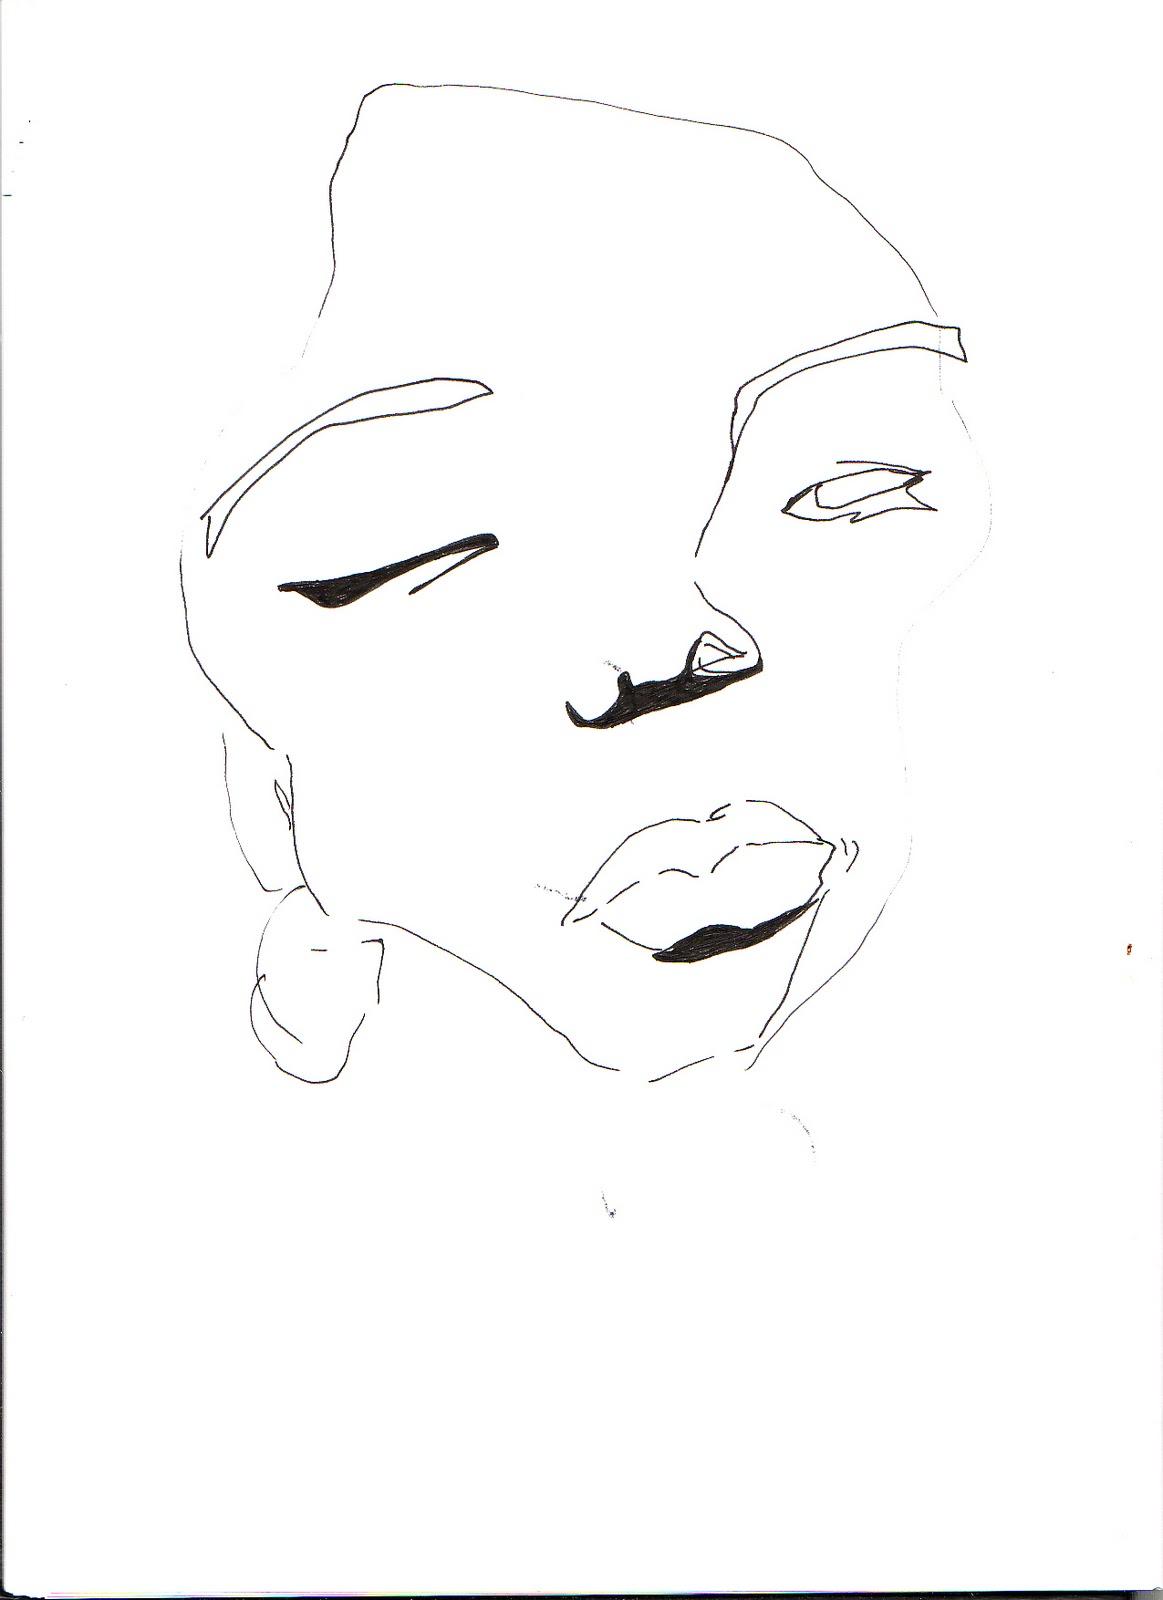 Gabriela-Sanchez-Drawing37.jpg